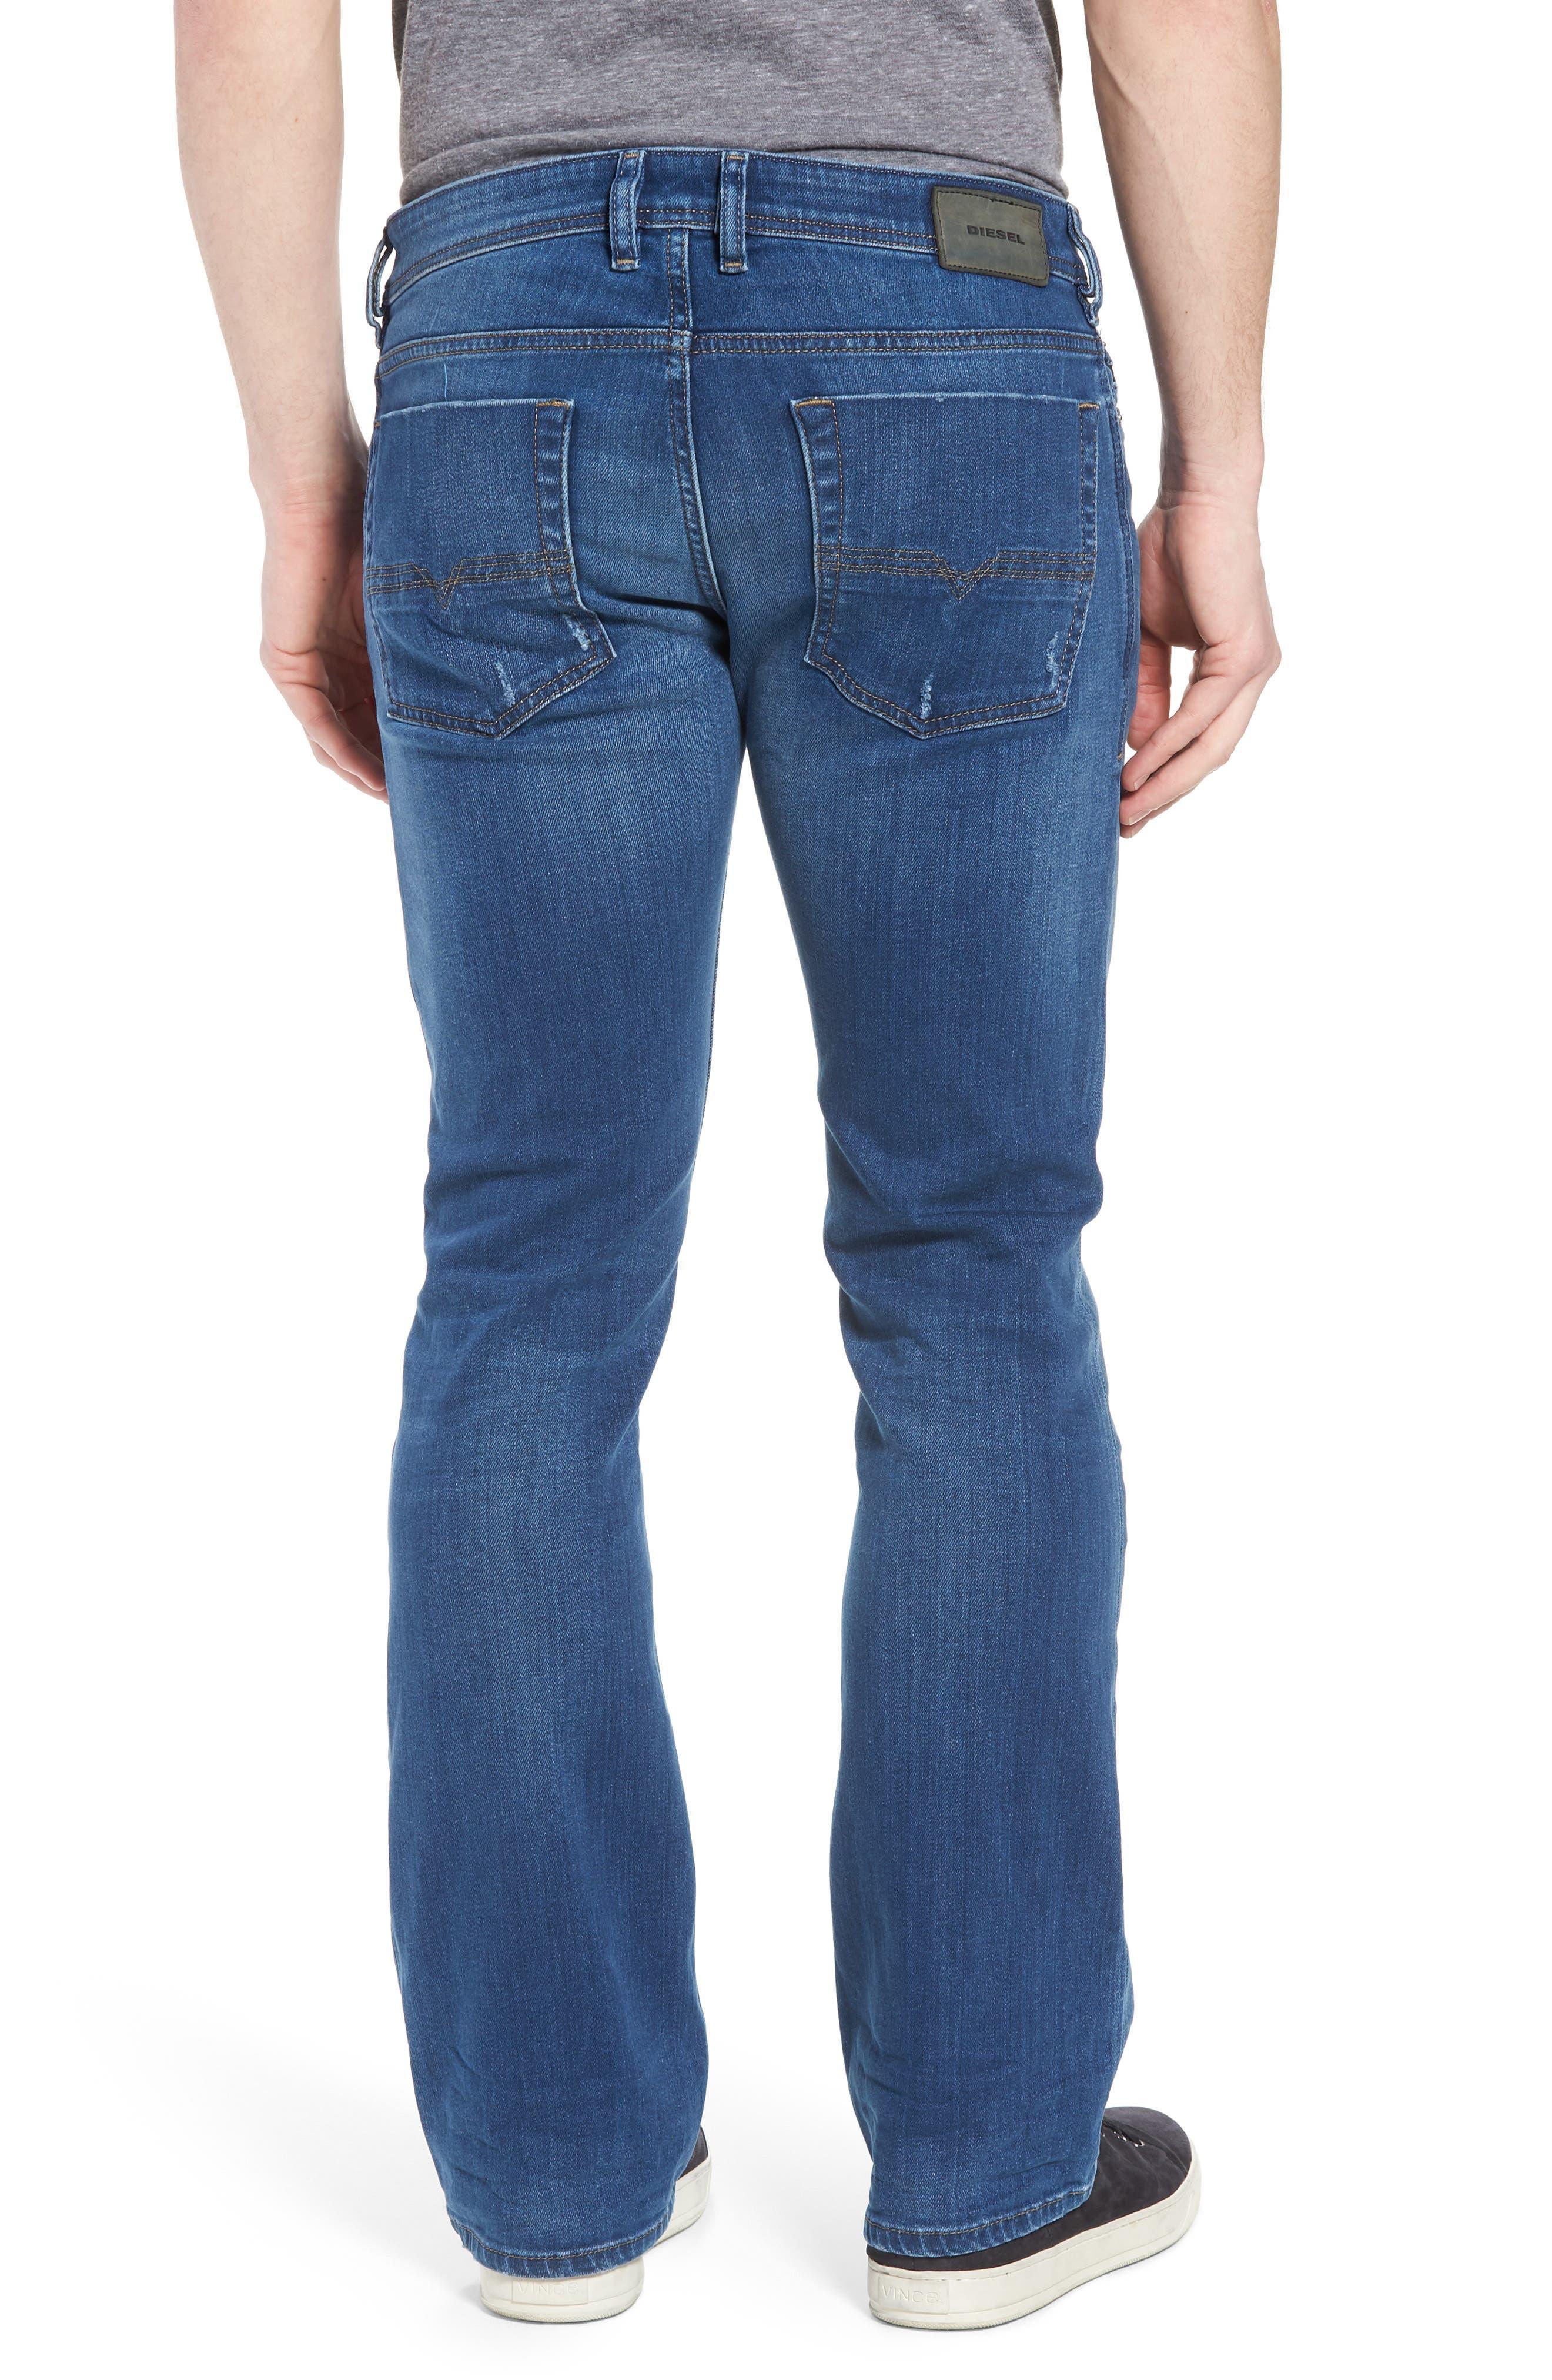 Zatiny Bootcut Jeans,                             Alternate thumbnail 2, color,                             084Qq